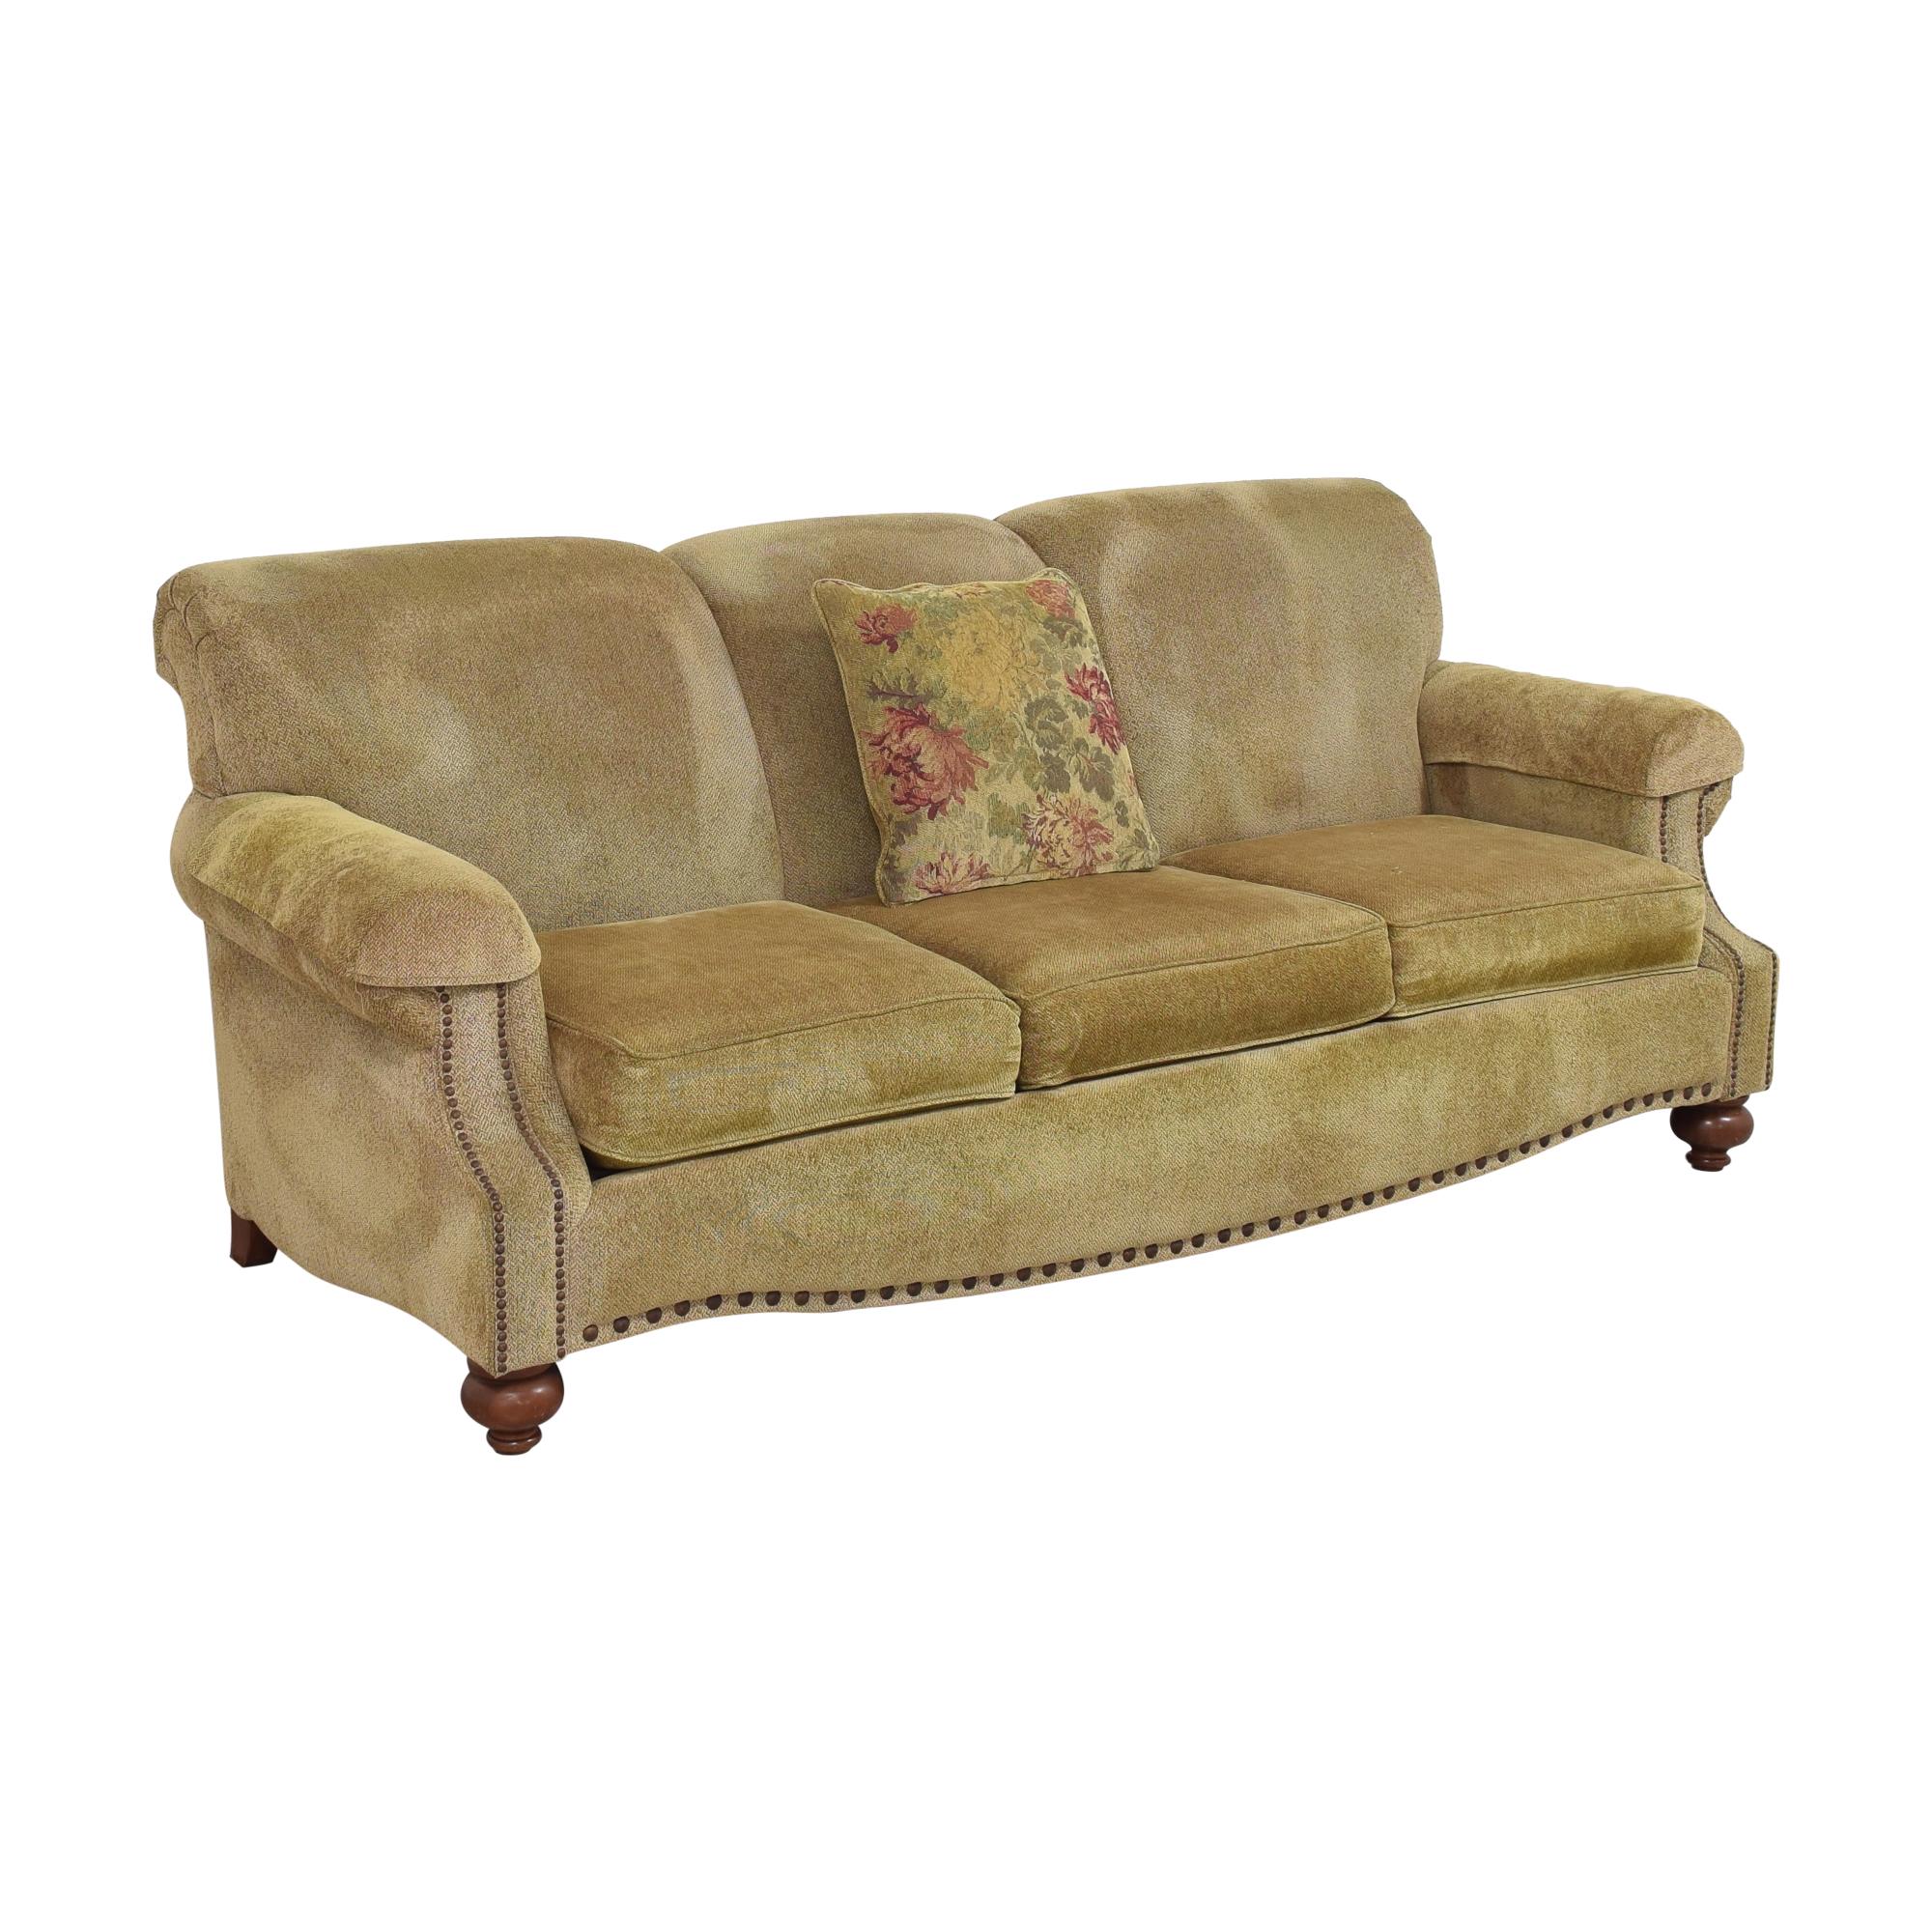 Bassett Furniture Three Cushion Nailhead Sofa sale